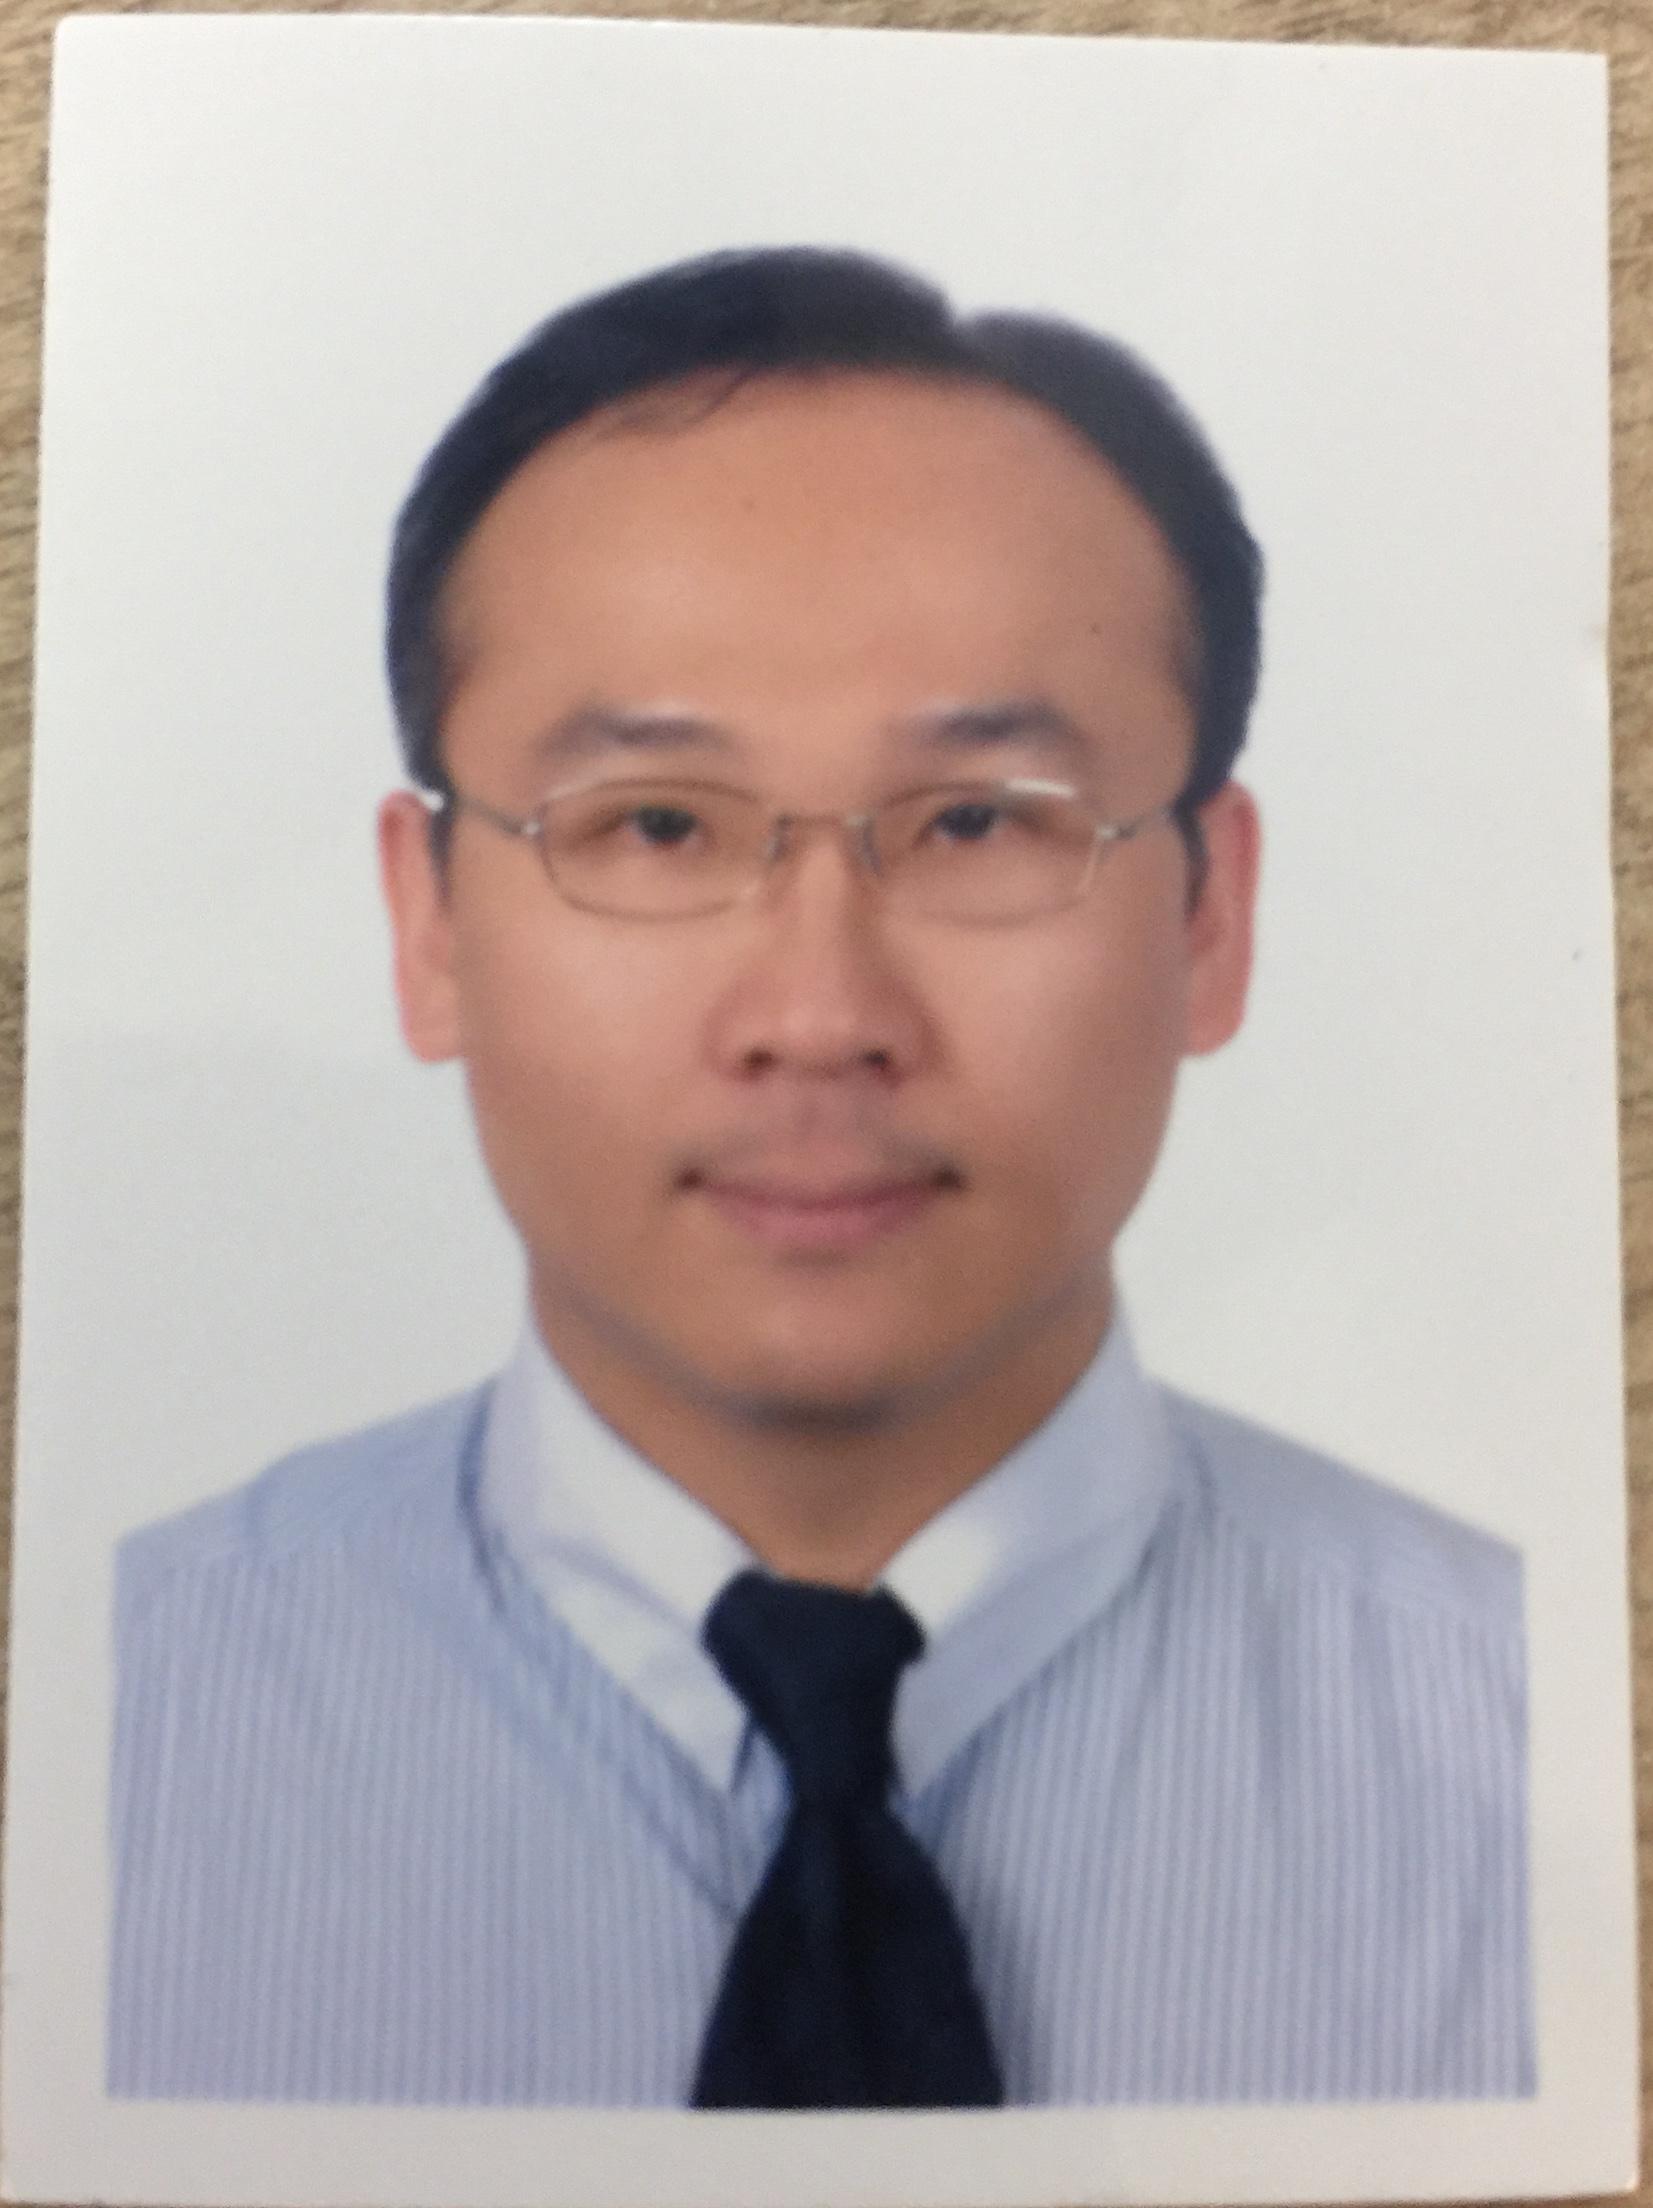 DR 潘恆新●新光醫院婦產科主治醫師